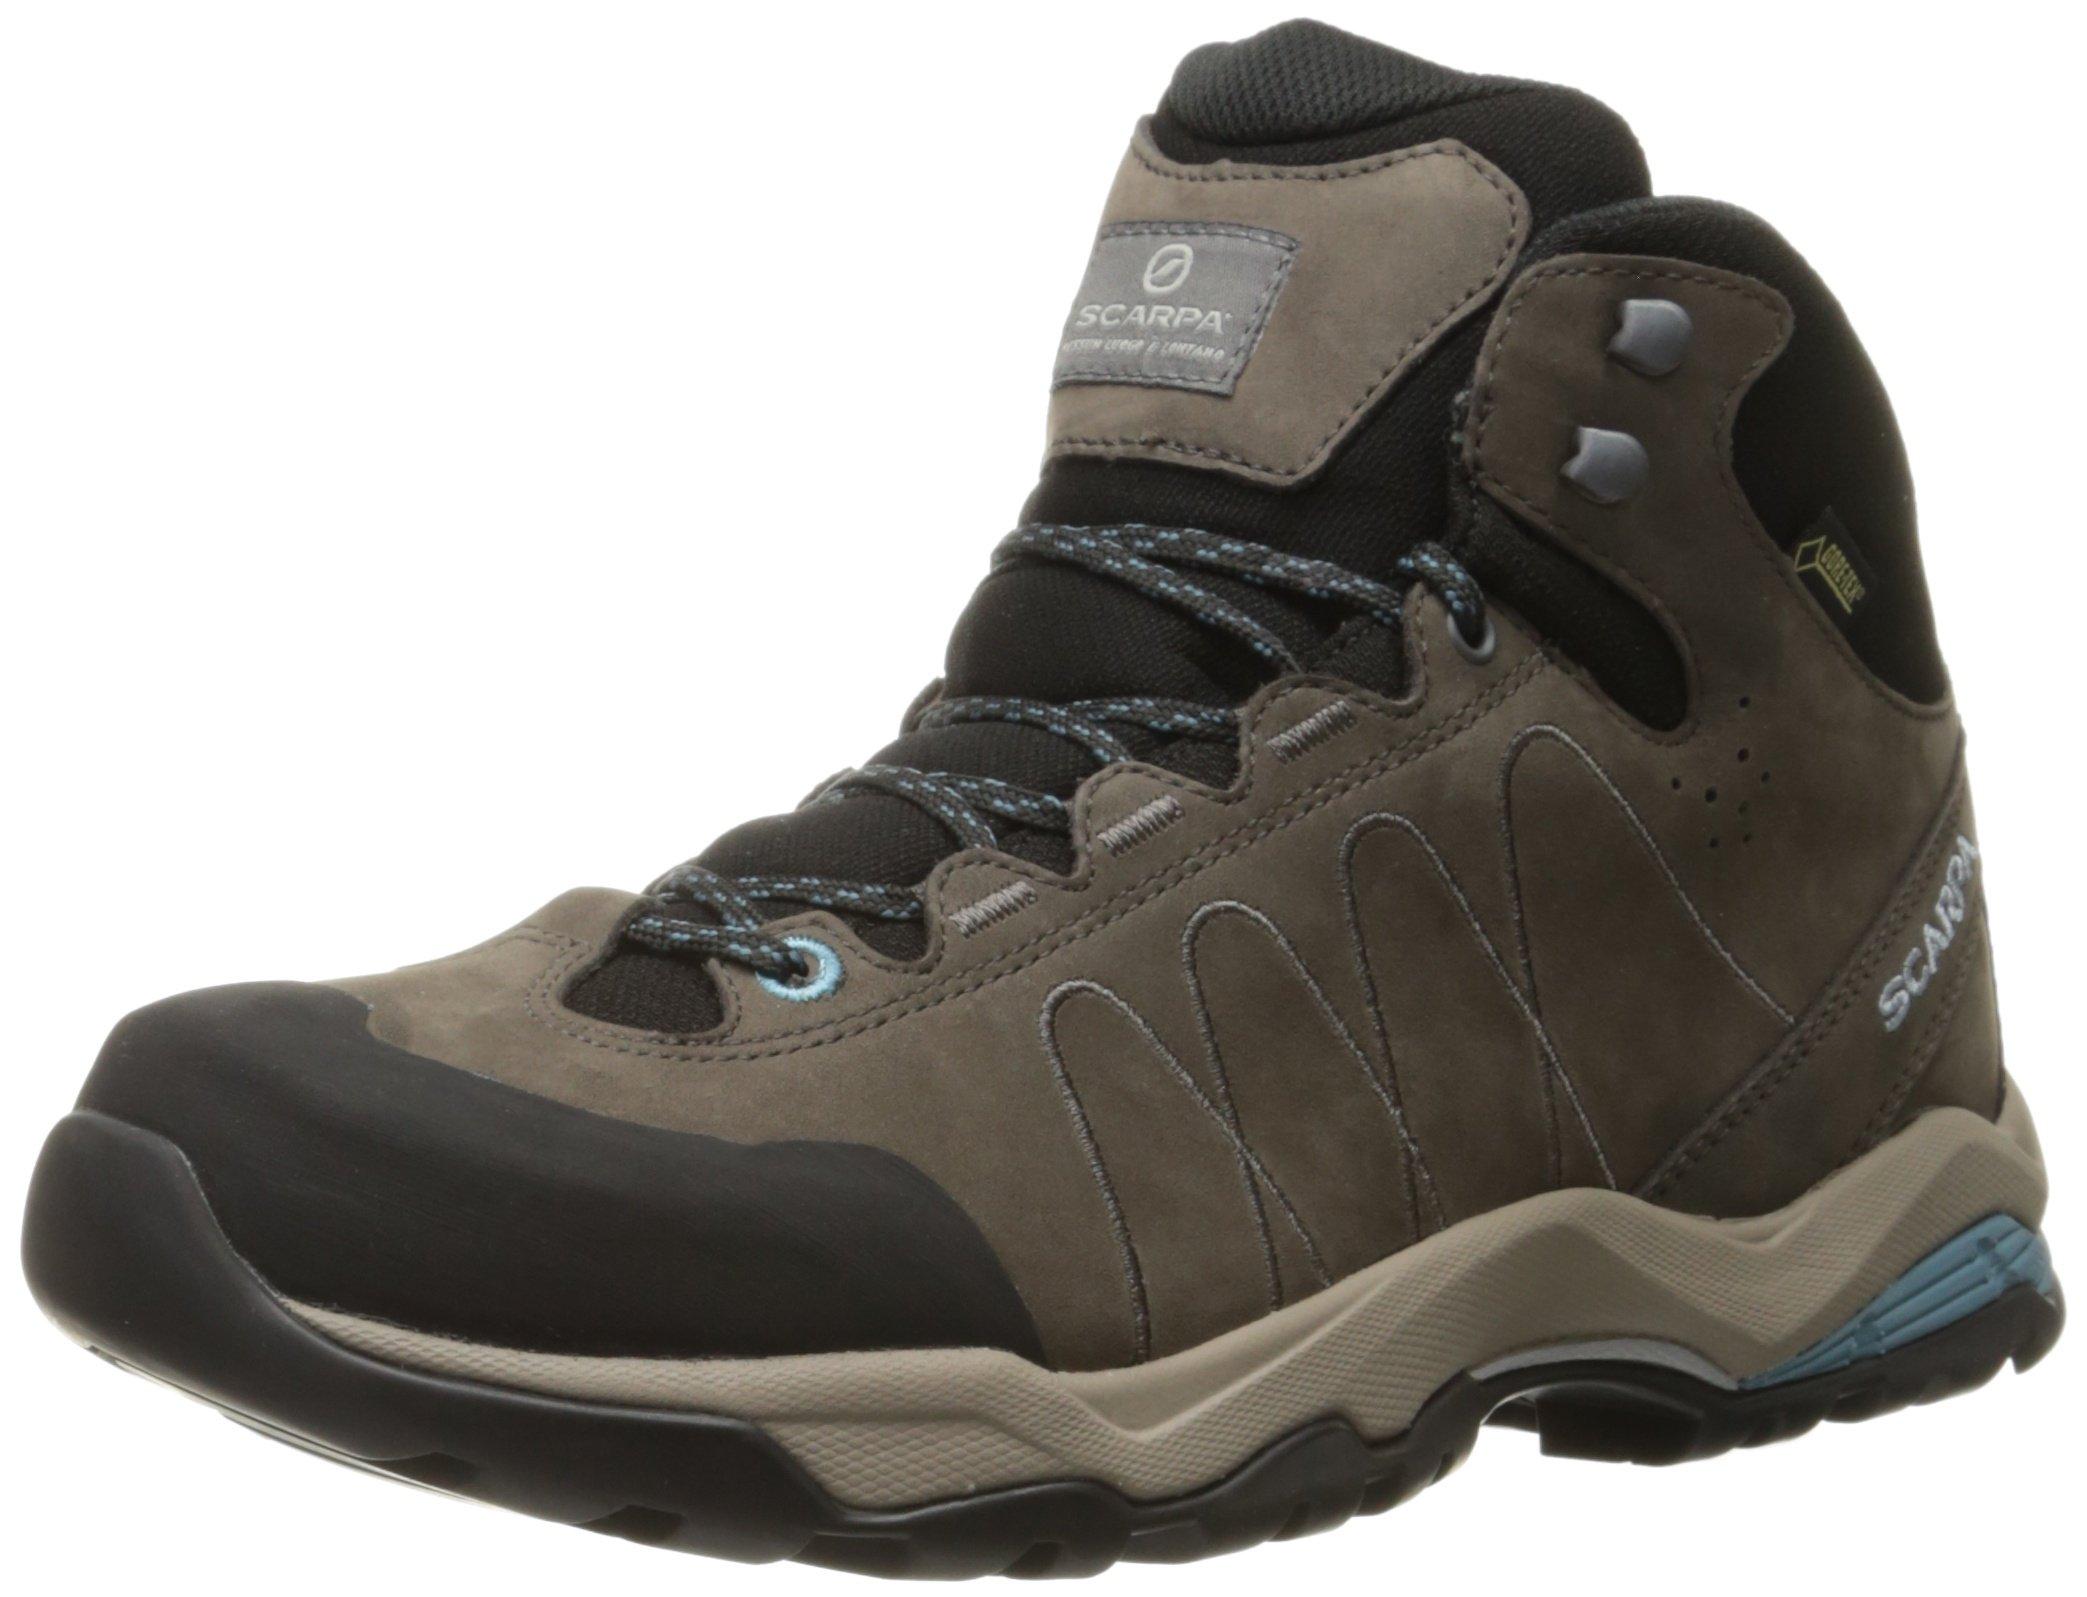 Scarpa Women's Moraine Plus Mid GTX WMN Hiking Boot, Charcoal/Air, 39 EU/7.5 M US